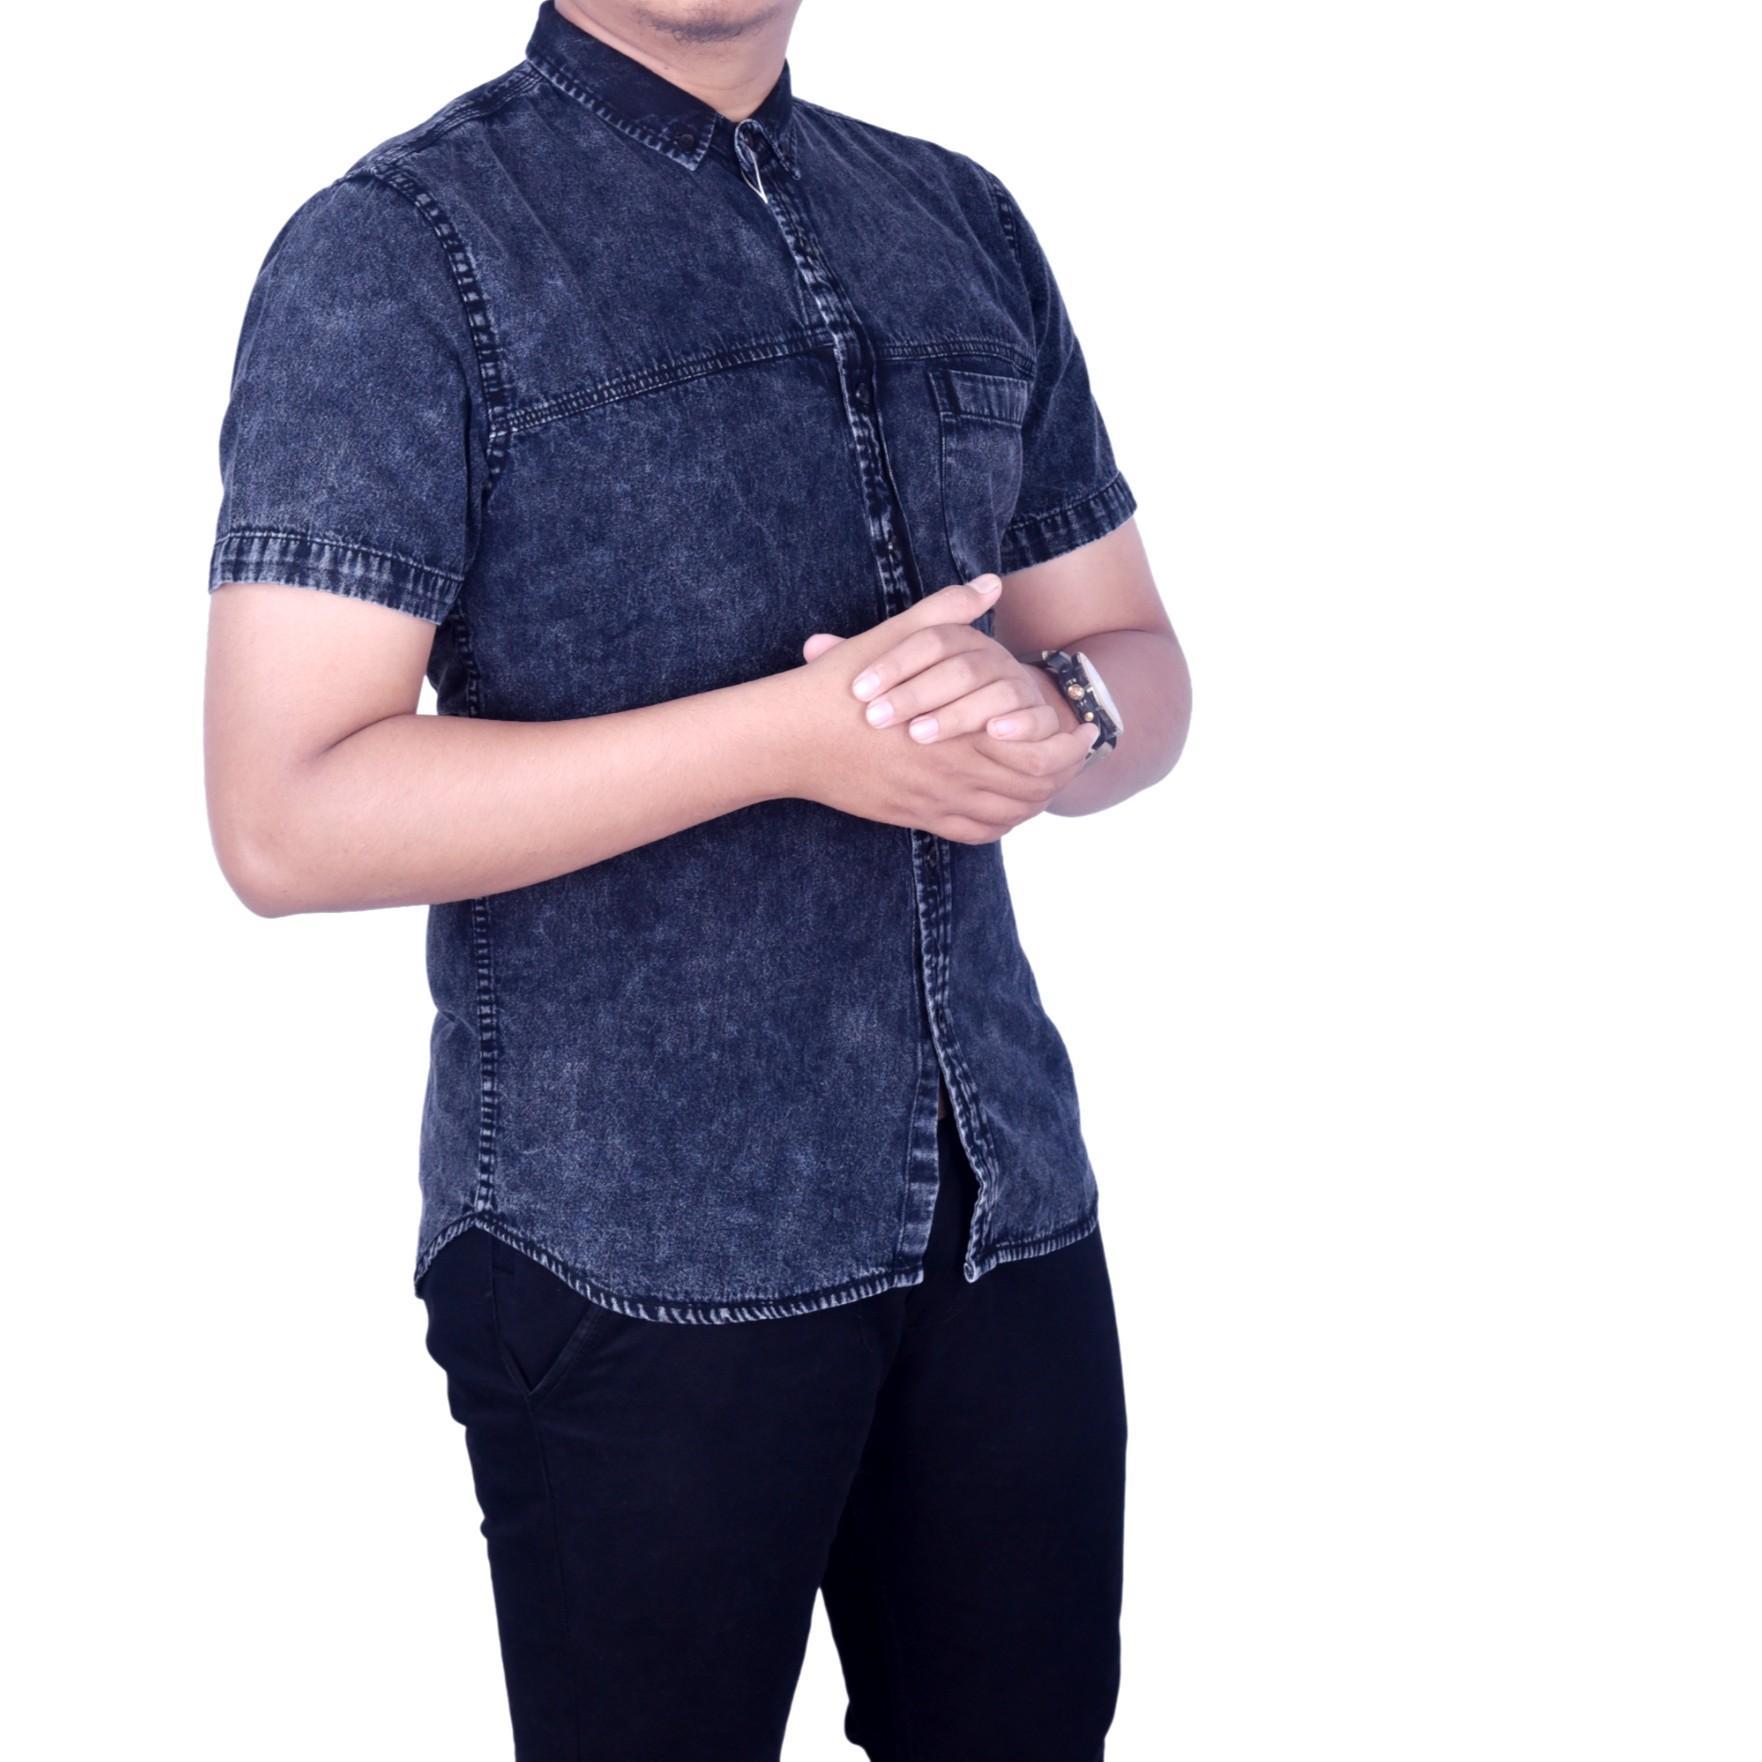 Dgm_Fashion1 Kemeja Pria Jeans Hitam Lengan Pendek /Kemeja Polos/Kemeja Batik/Kemeja Casual/Kemeja